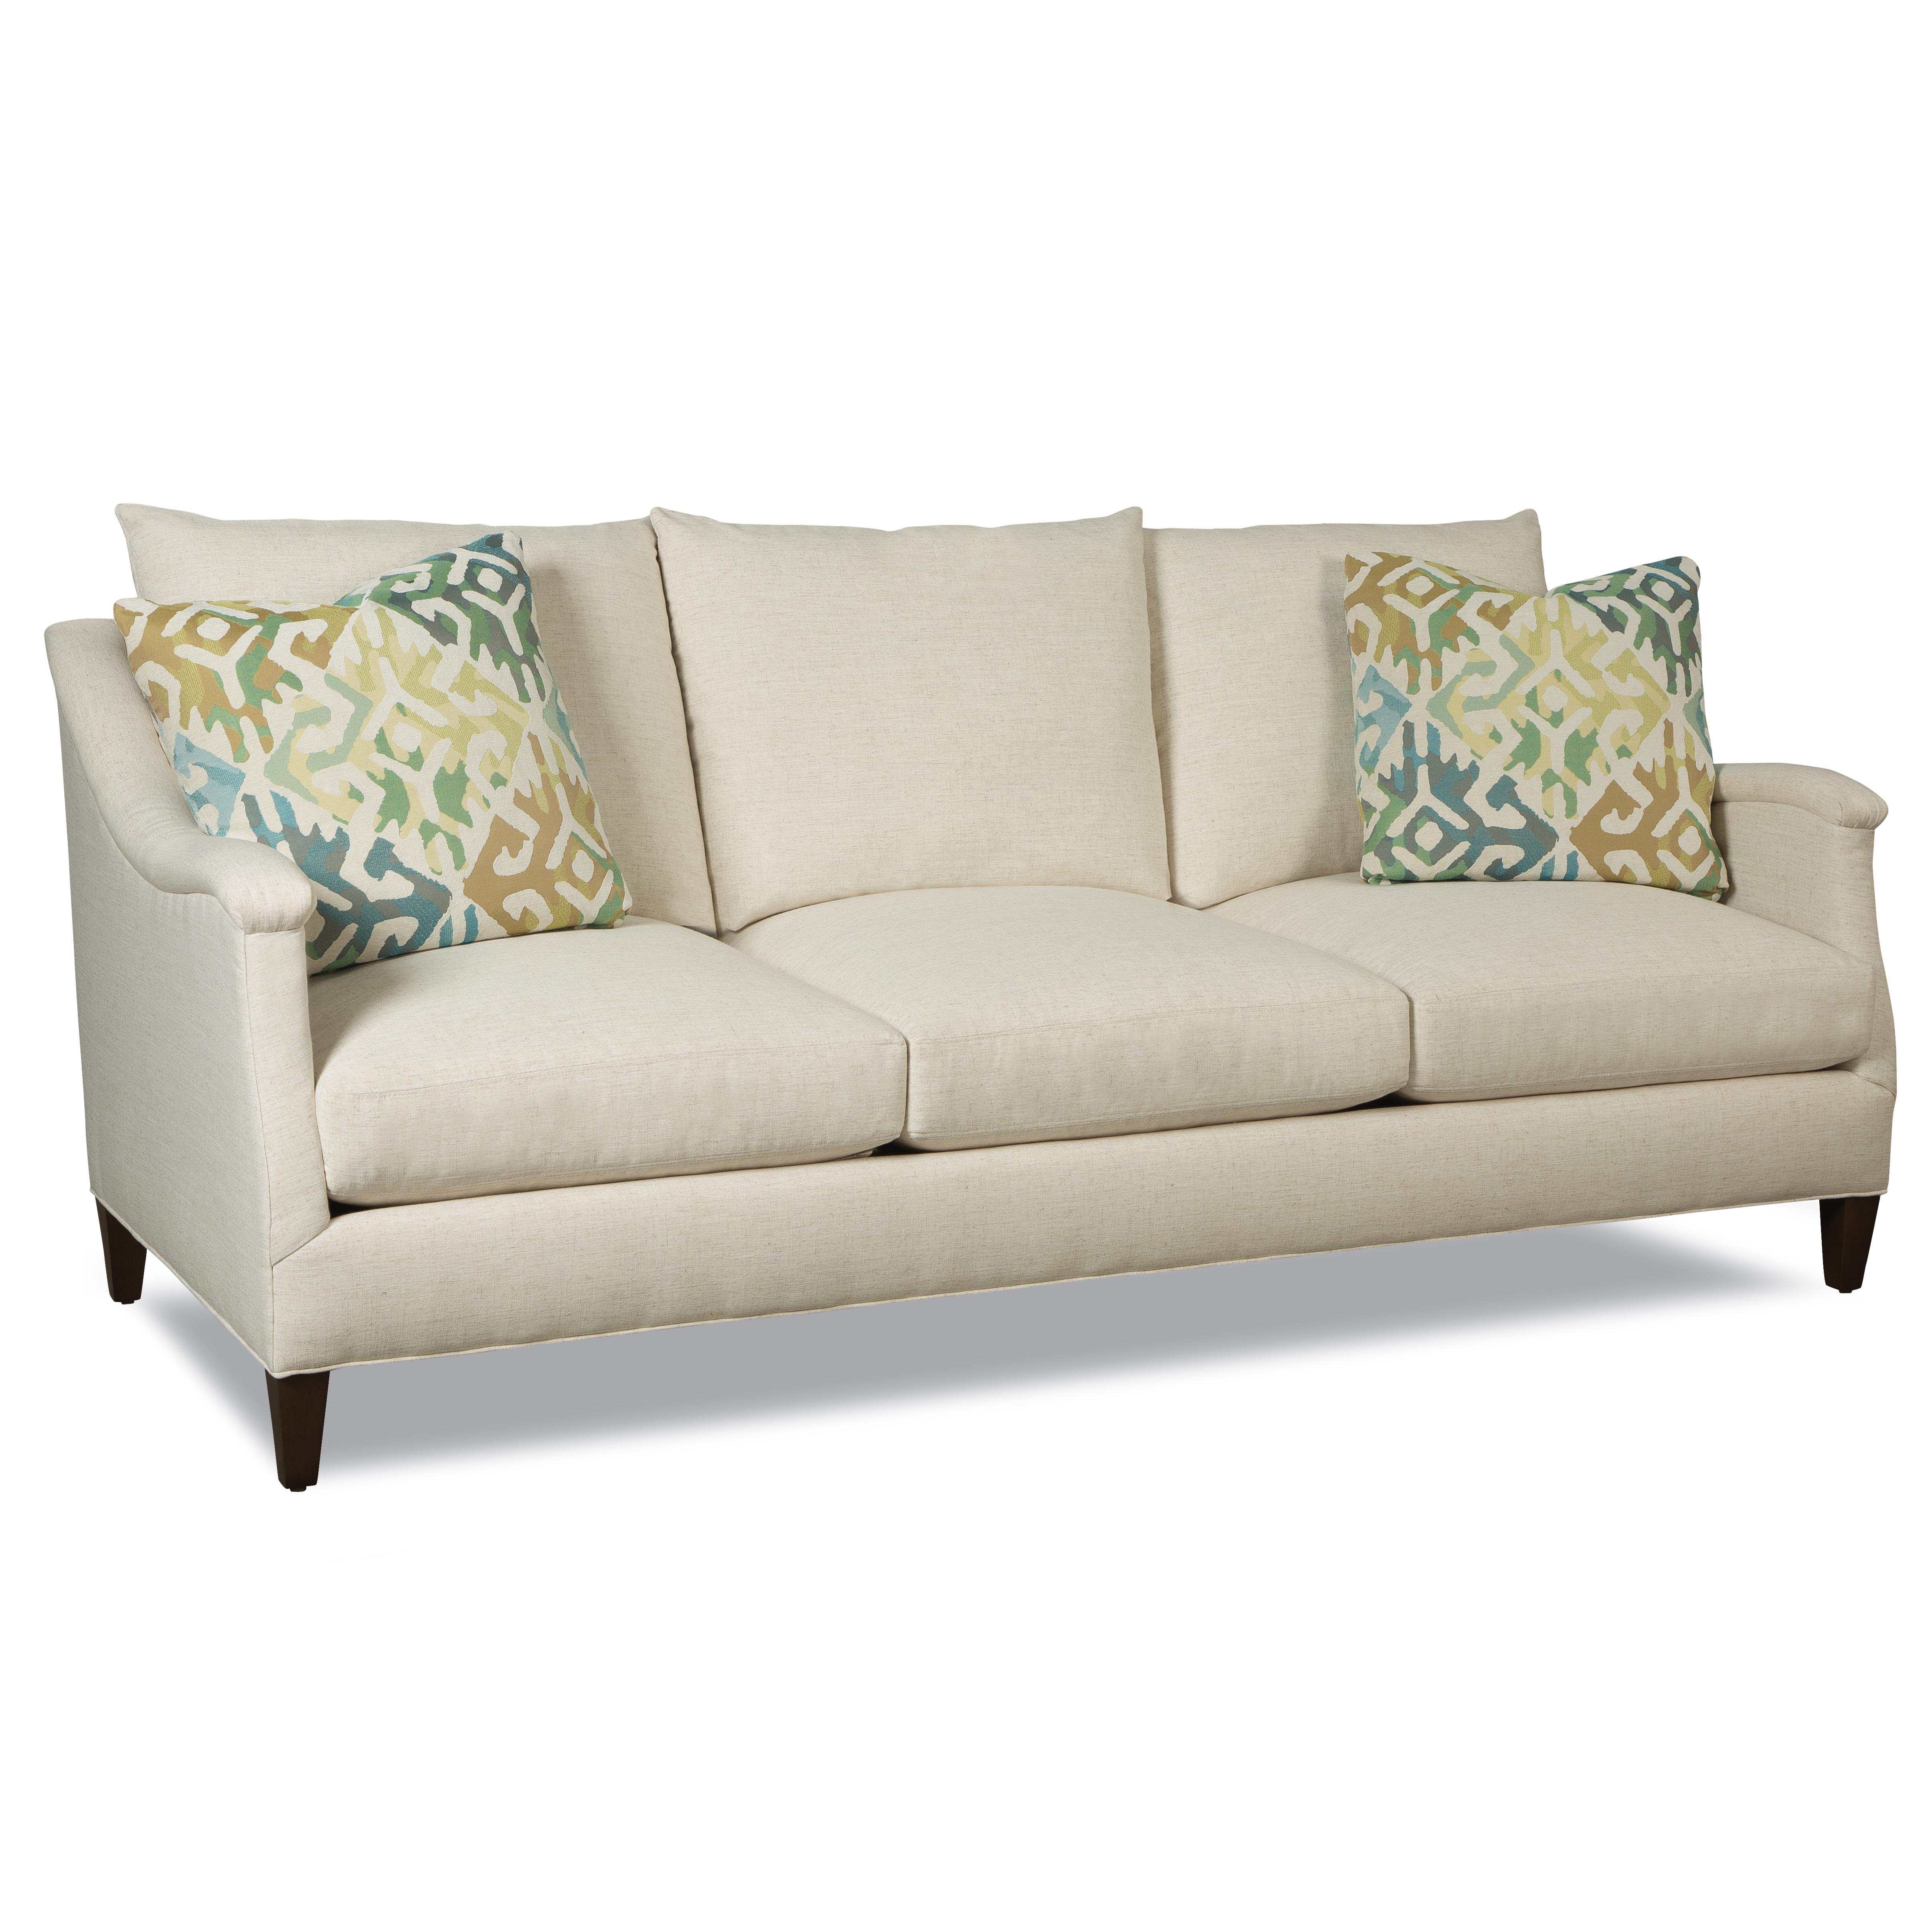 Get The Look Saratoga Signature Furniture and Interiors